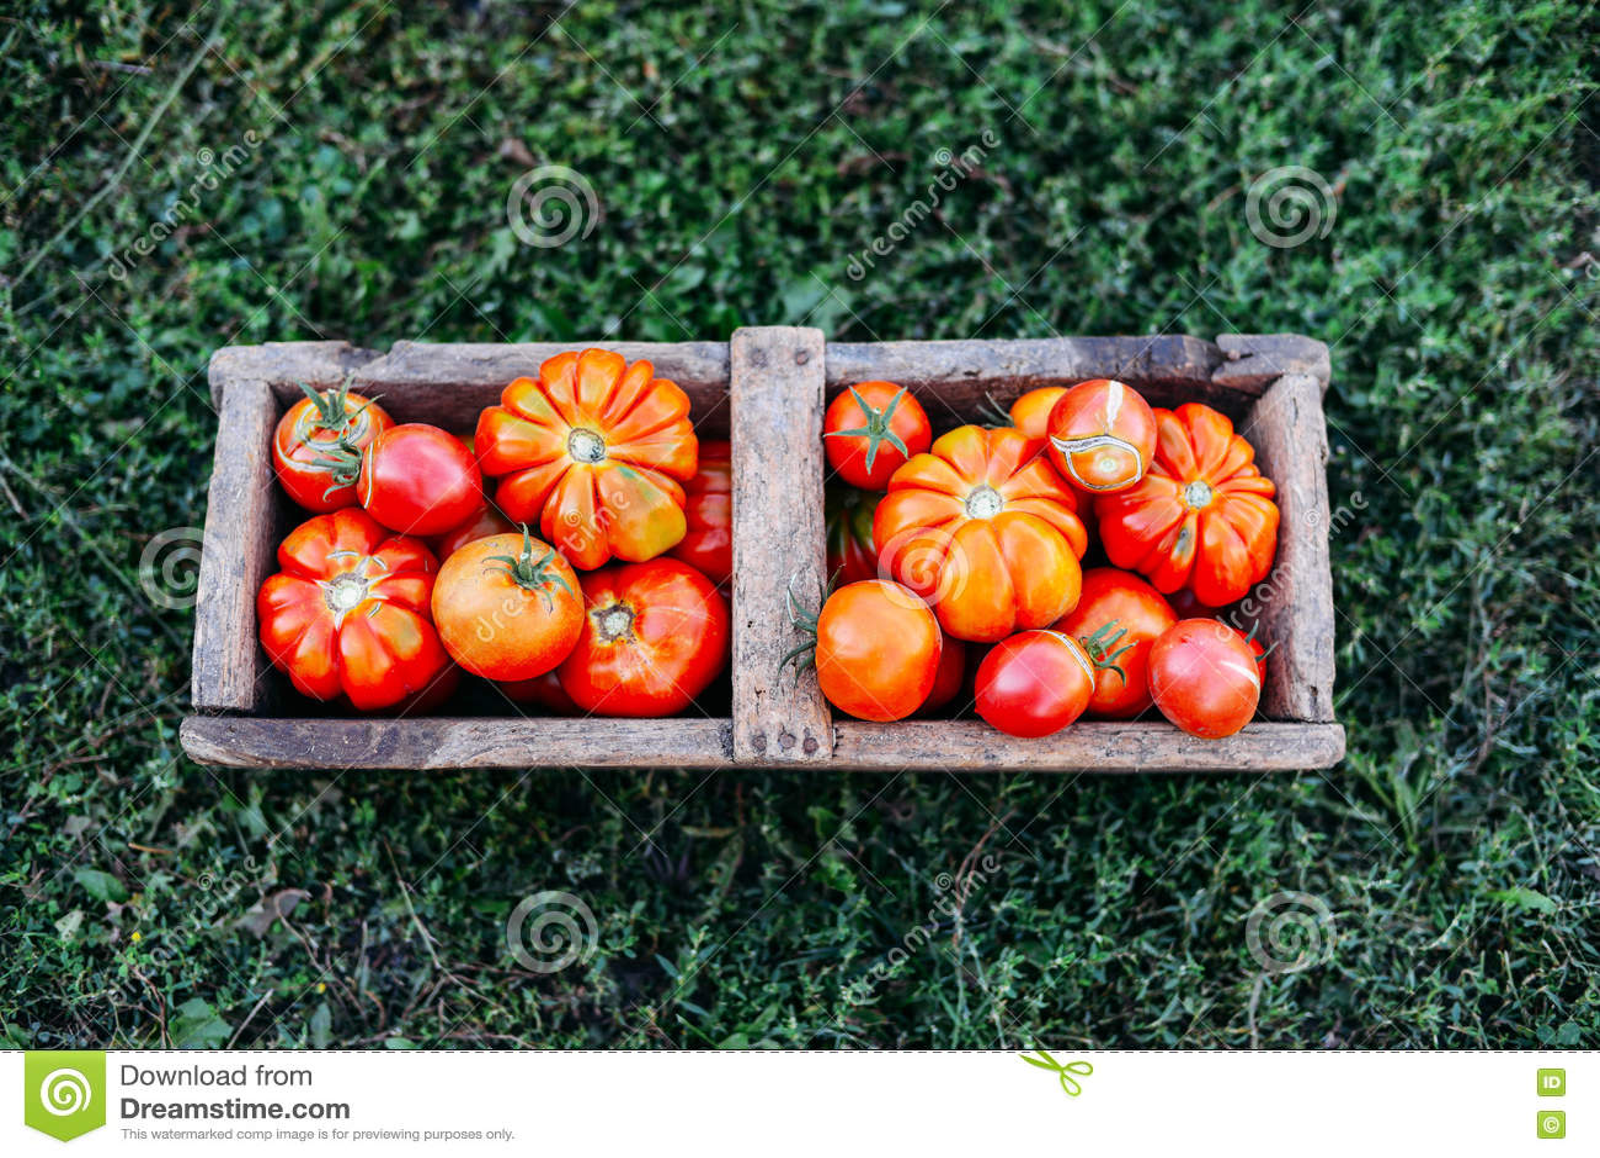 Pomodori assortiti in sacchi di carta marroni Vari pomodori in ciotola